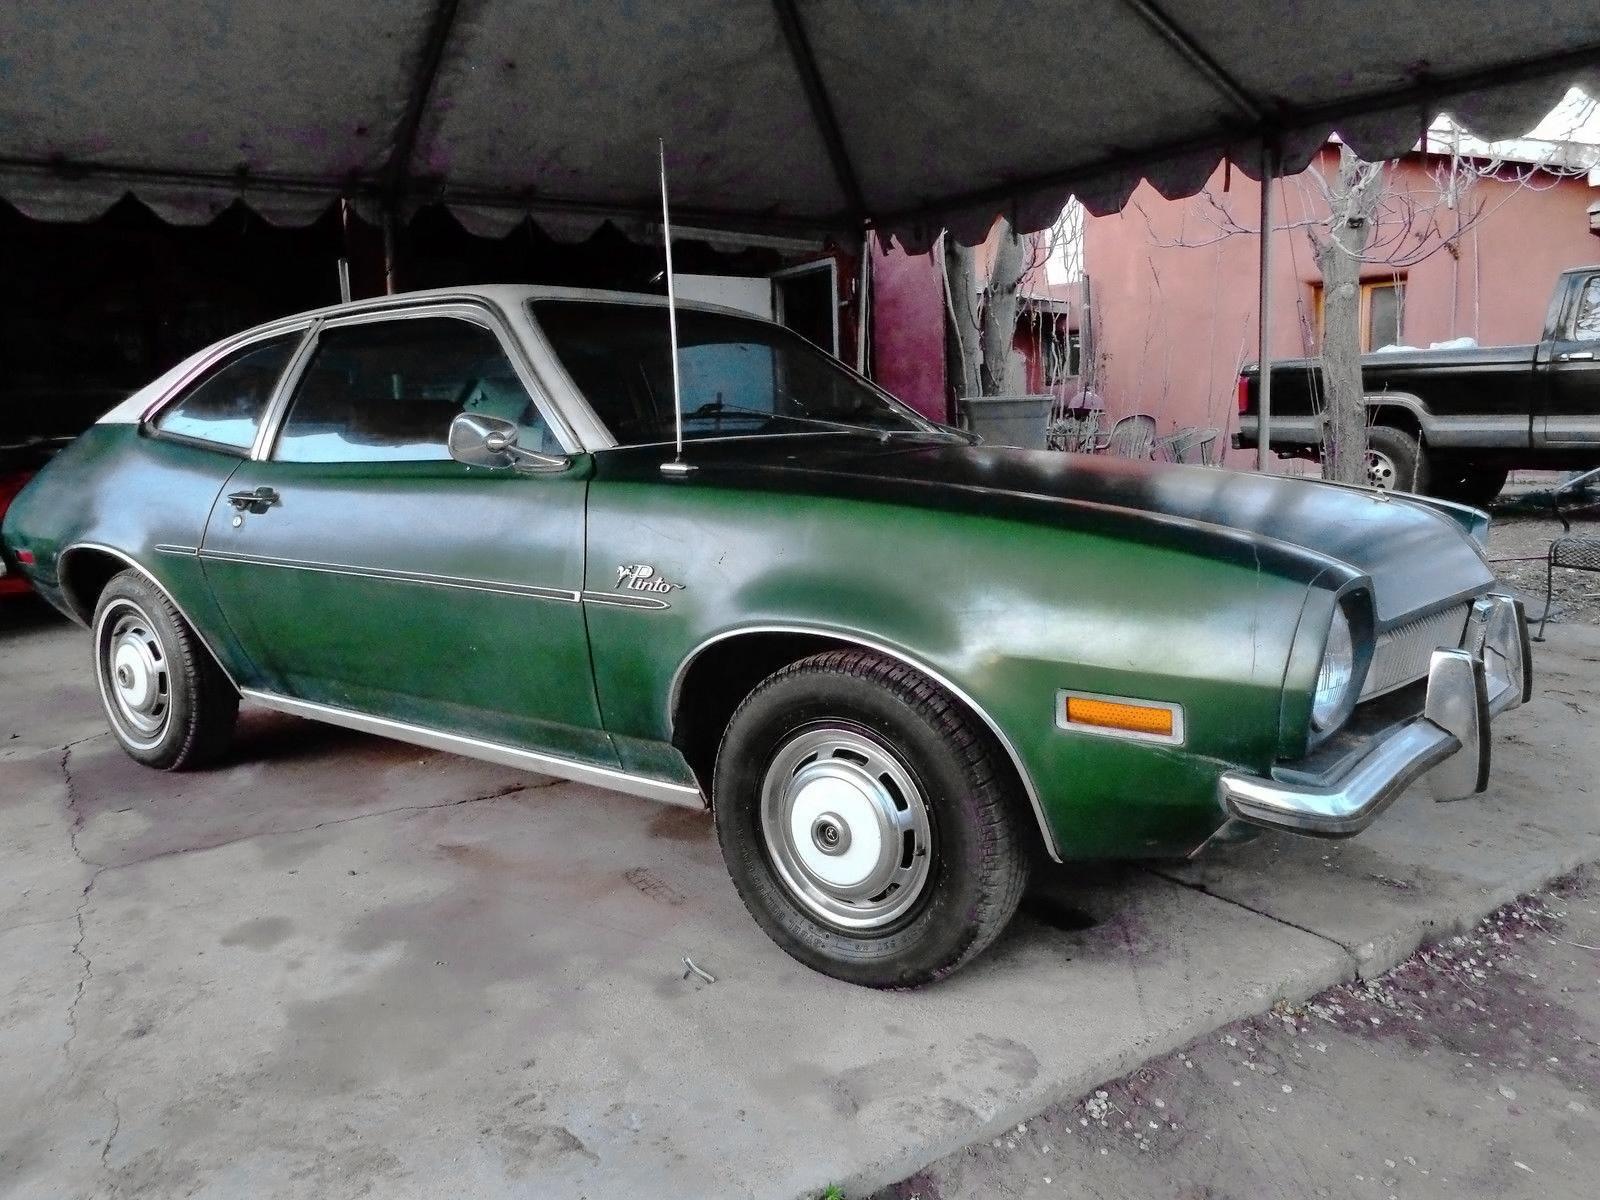 Desert Pony: 1972 Ford Pinto